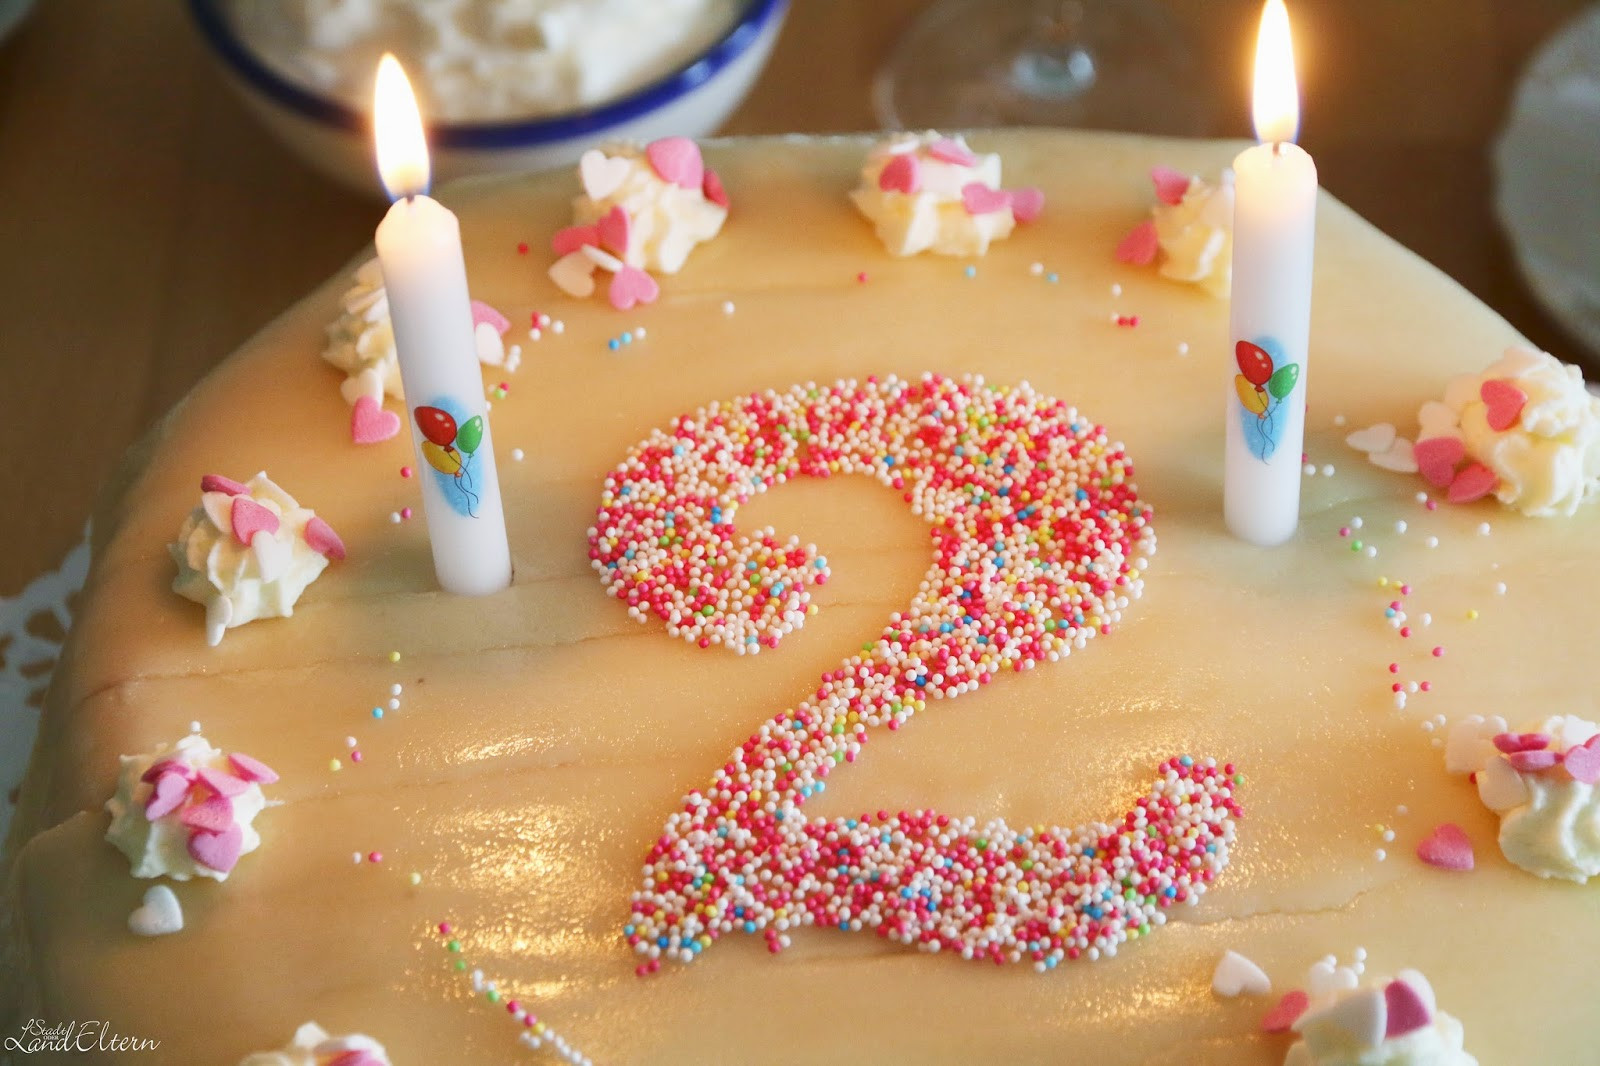 Geburtstagstorte 2 Jahre  Lus 2 Geburtstag inkl Geschenkideen